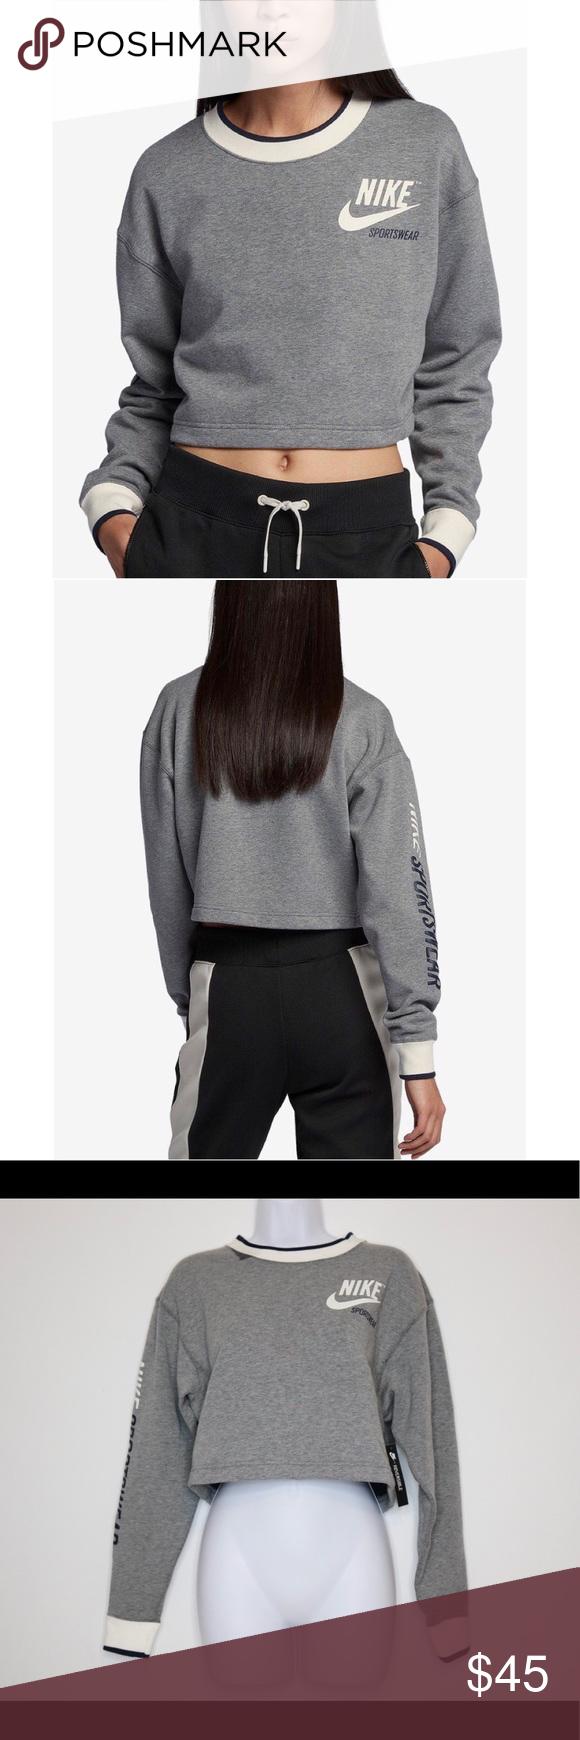 Predownload: Nike Reversible Fleece Cropped Sweatshirt Crop Sweatshirt Clothes Design Sweatshirts [ 1740 x 580 Pixel ]